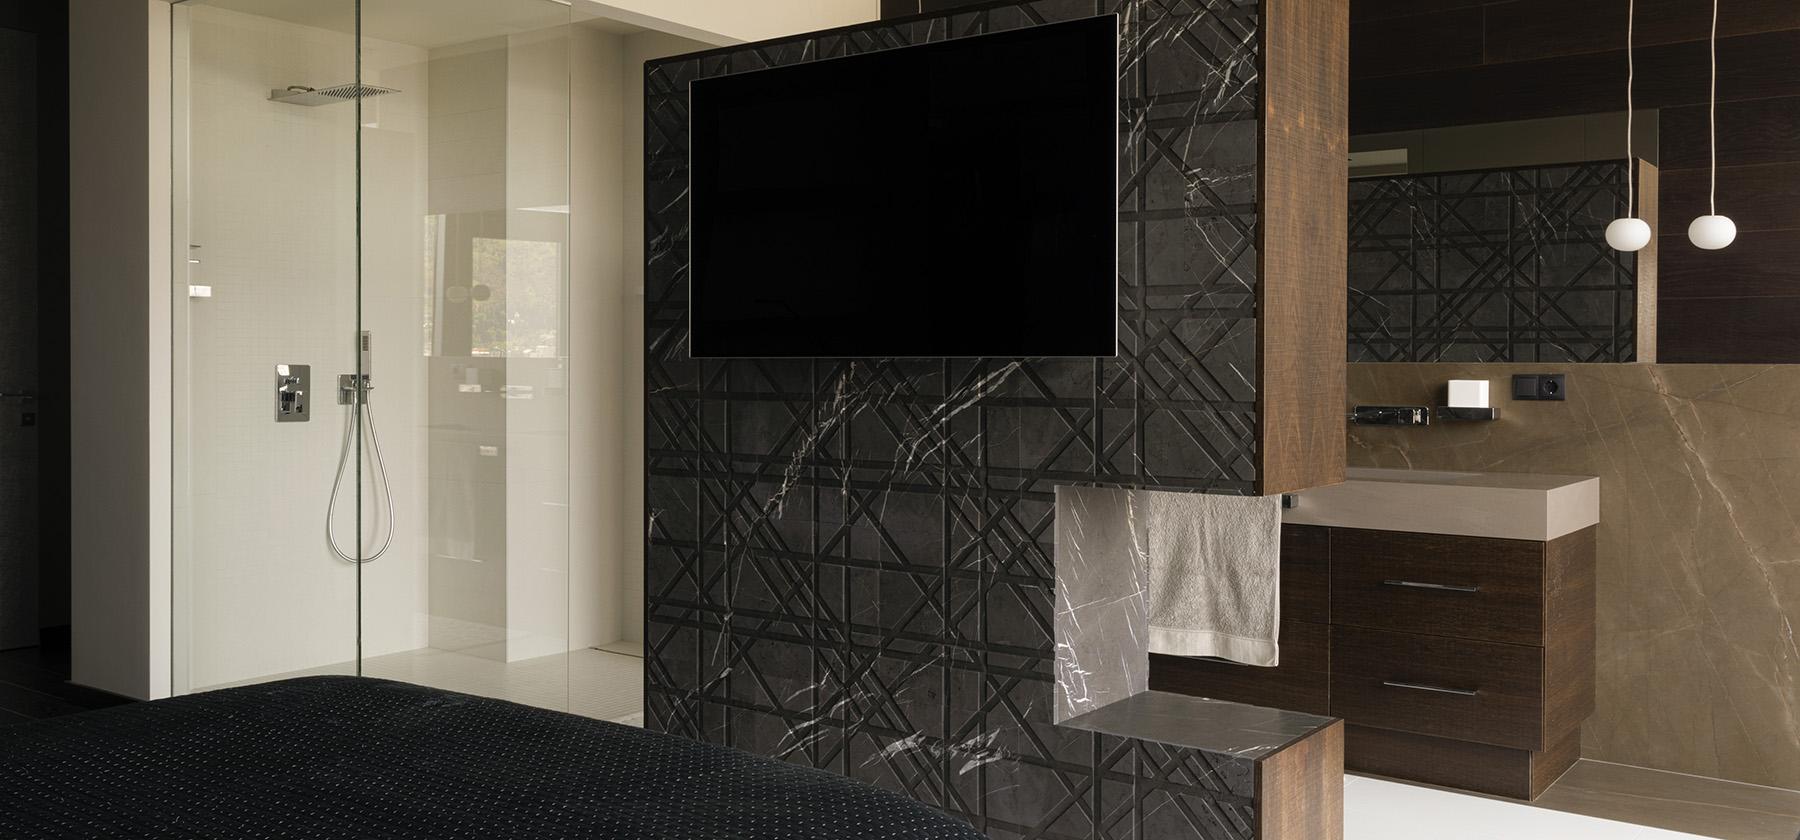 3_KingDavid_tartan_interior_wall_covering